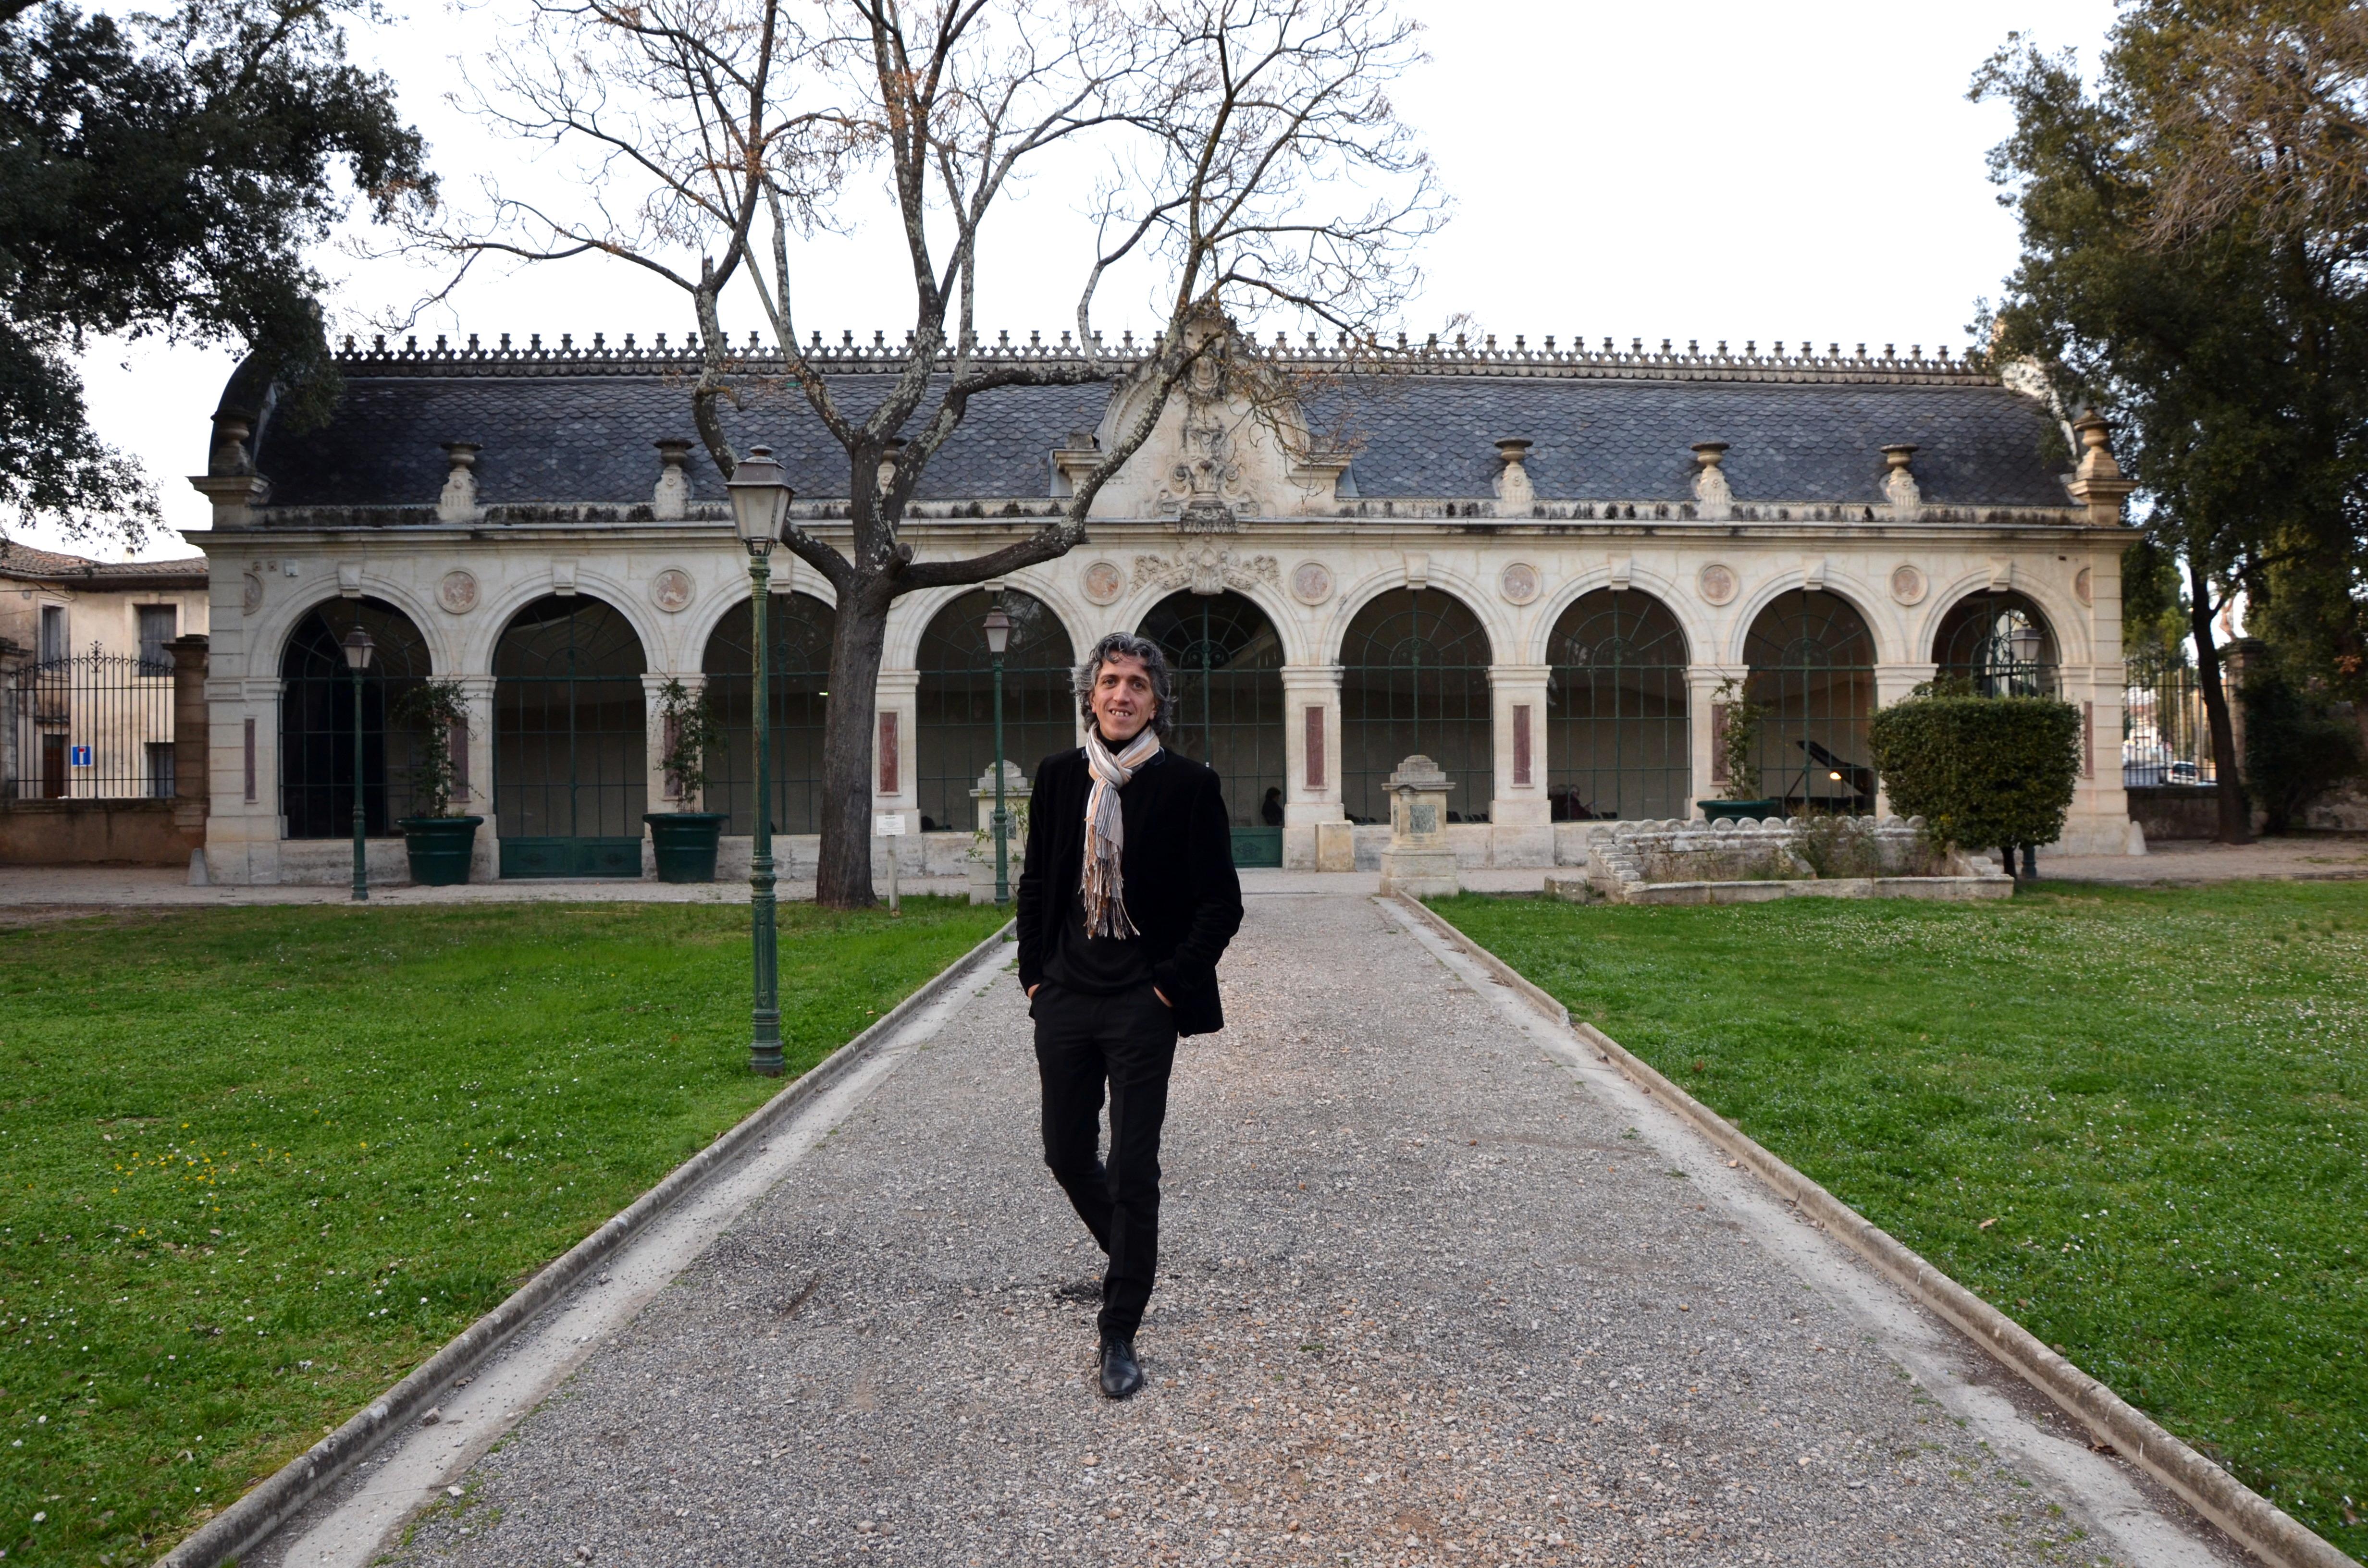 Vittorio Forte à l'Orangerie